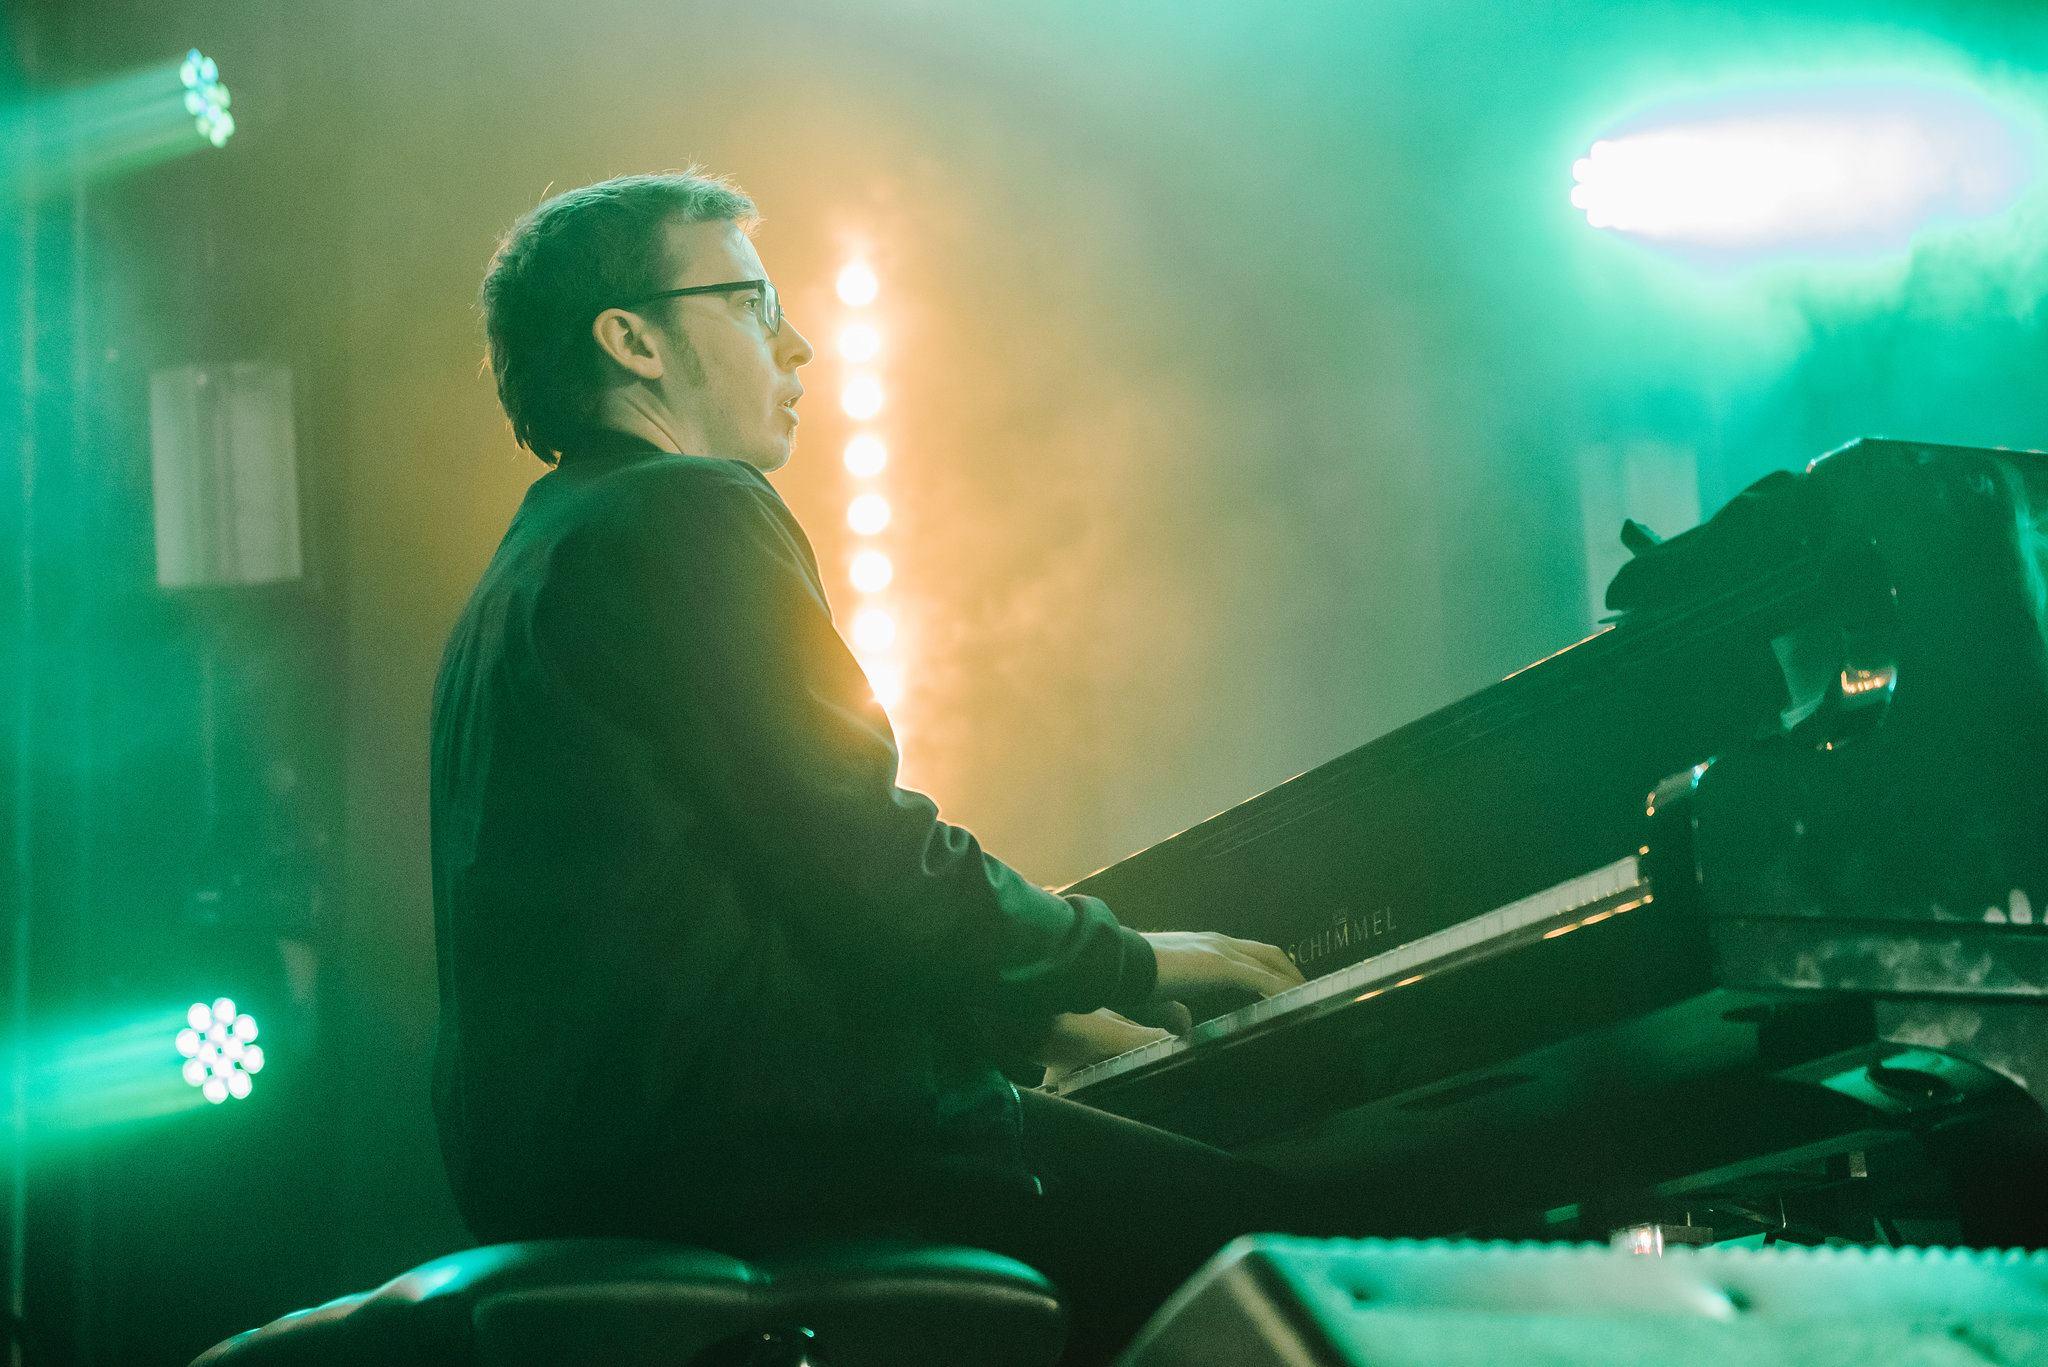 Festival No 6 festival news : The mighty leftfield piano trio GoGo Penguin at Festival No.6 2018.